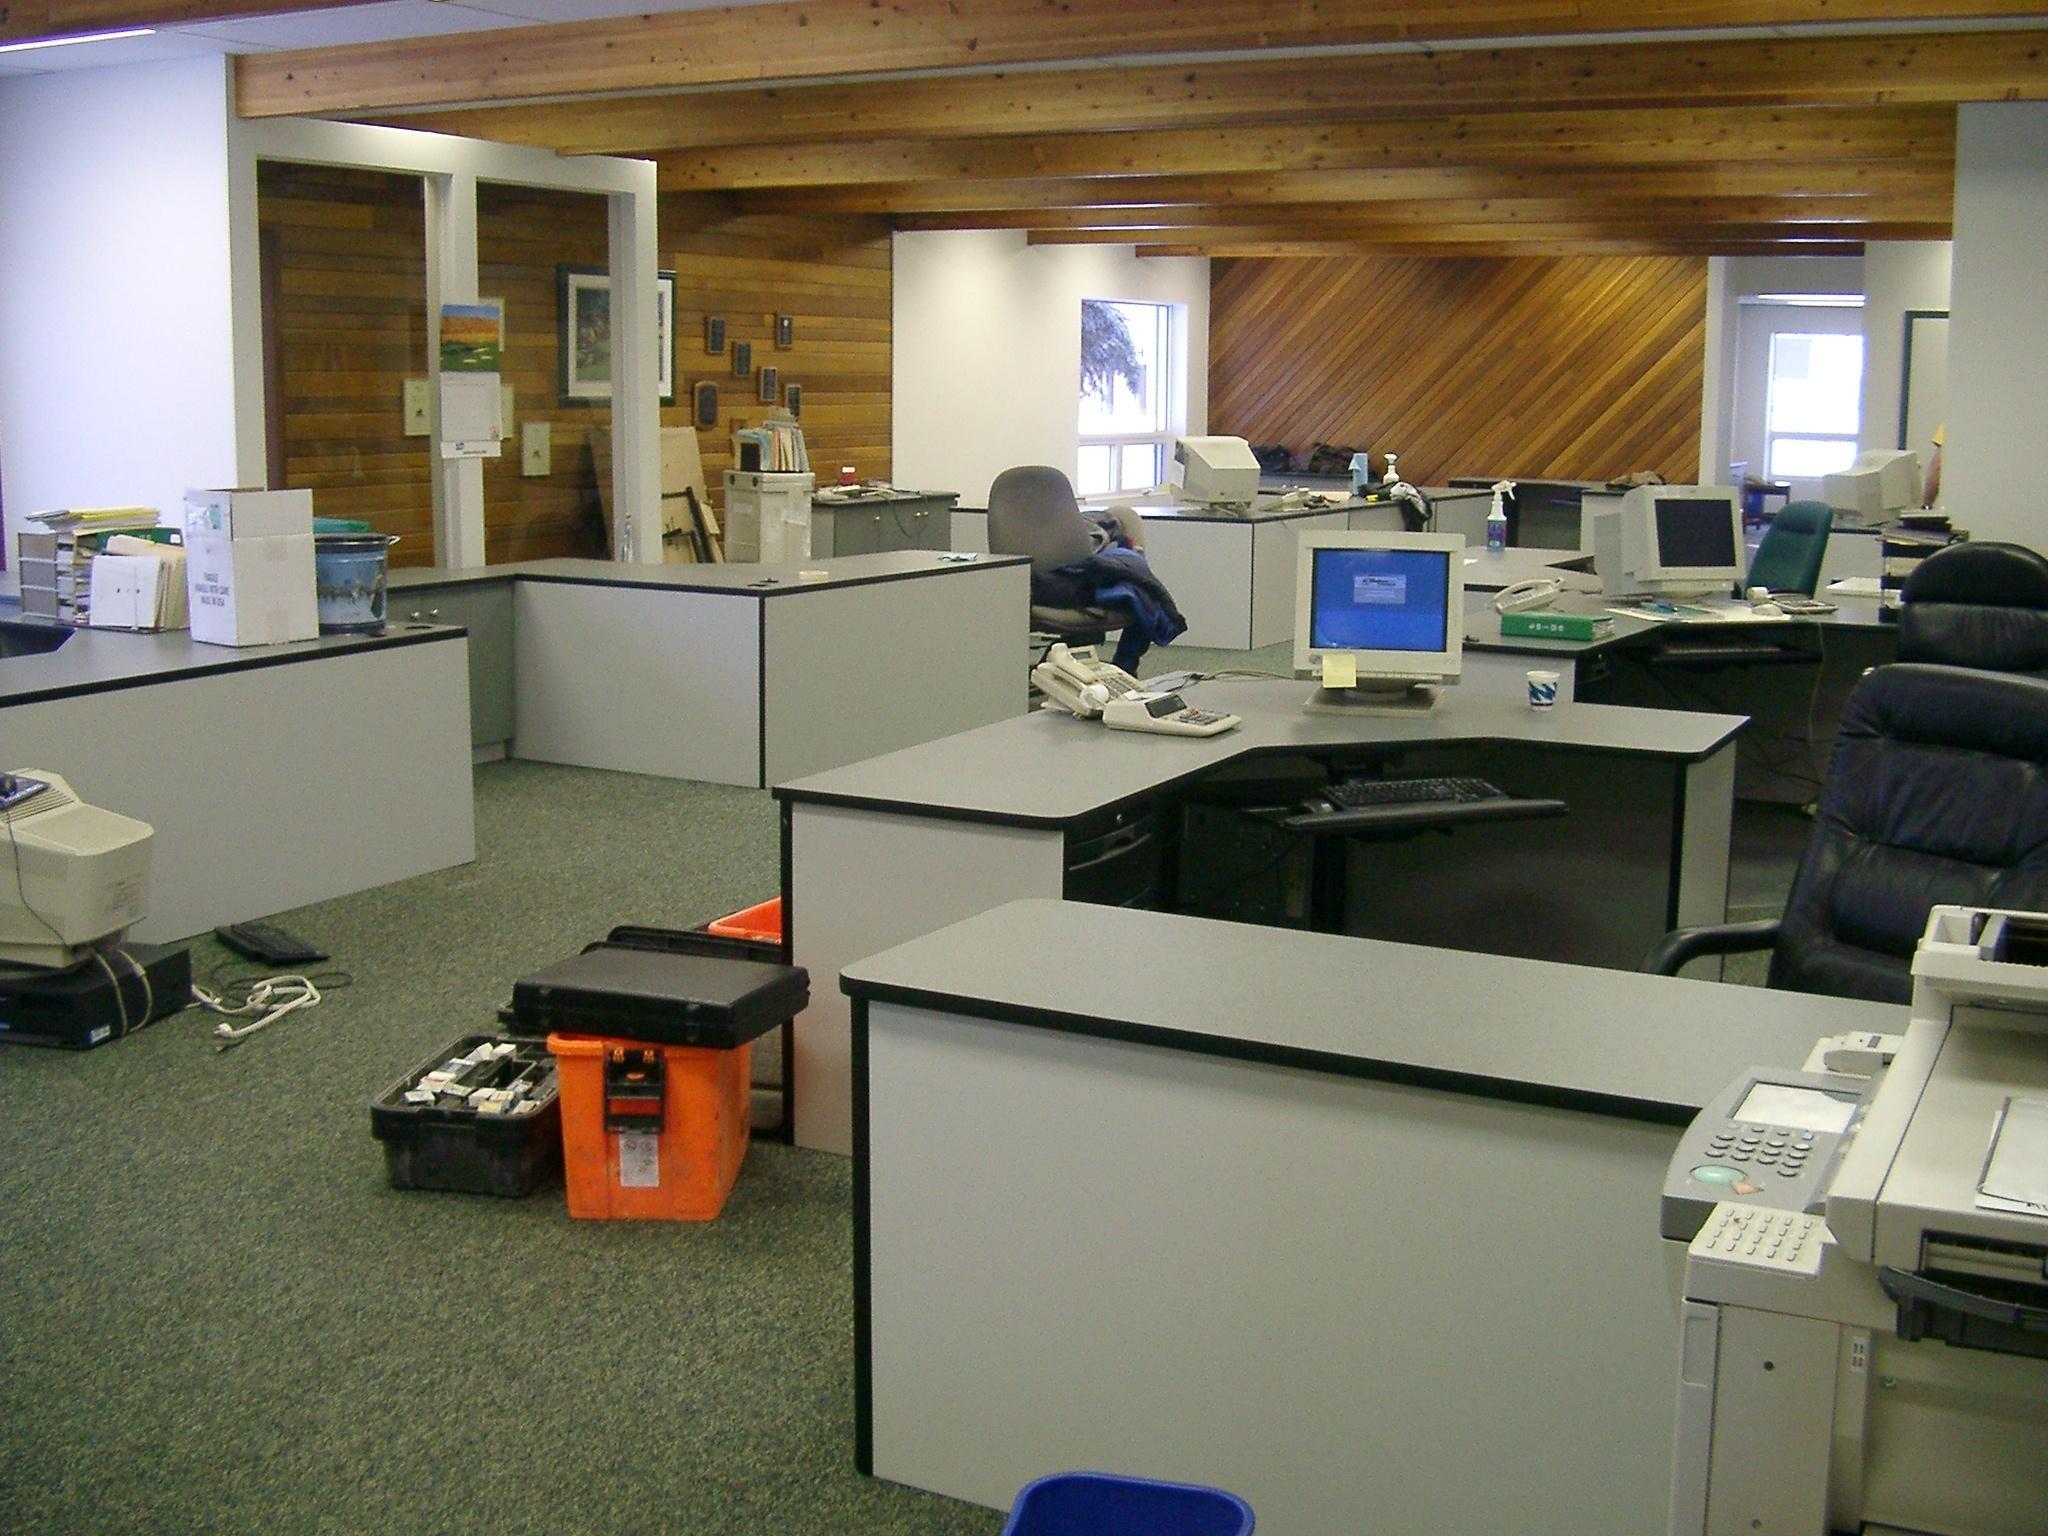 GENERAL CONTRACTORS, OFFICE & WAREHOUSE, DESIGN &  CONSTRUCTION: RENOVATION PROJECT CONTRACTORS EDMONTON